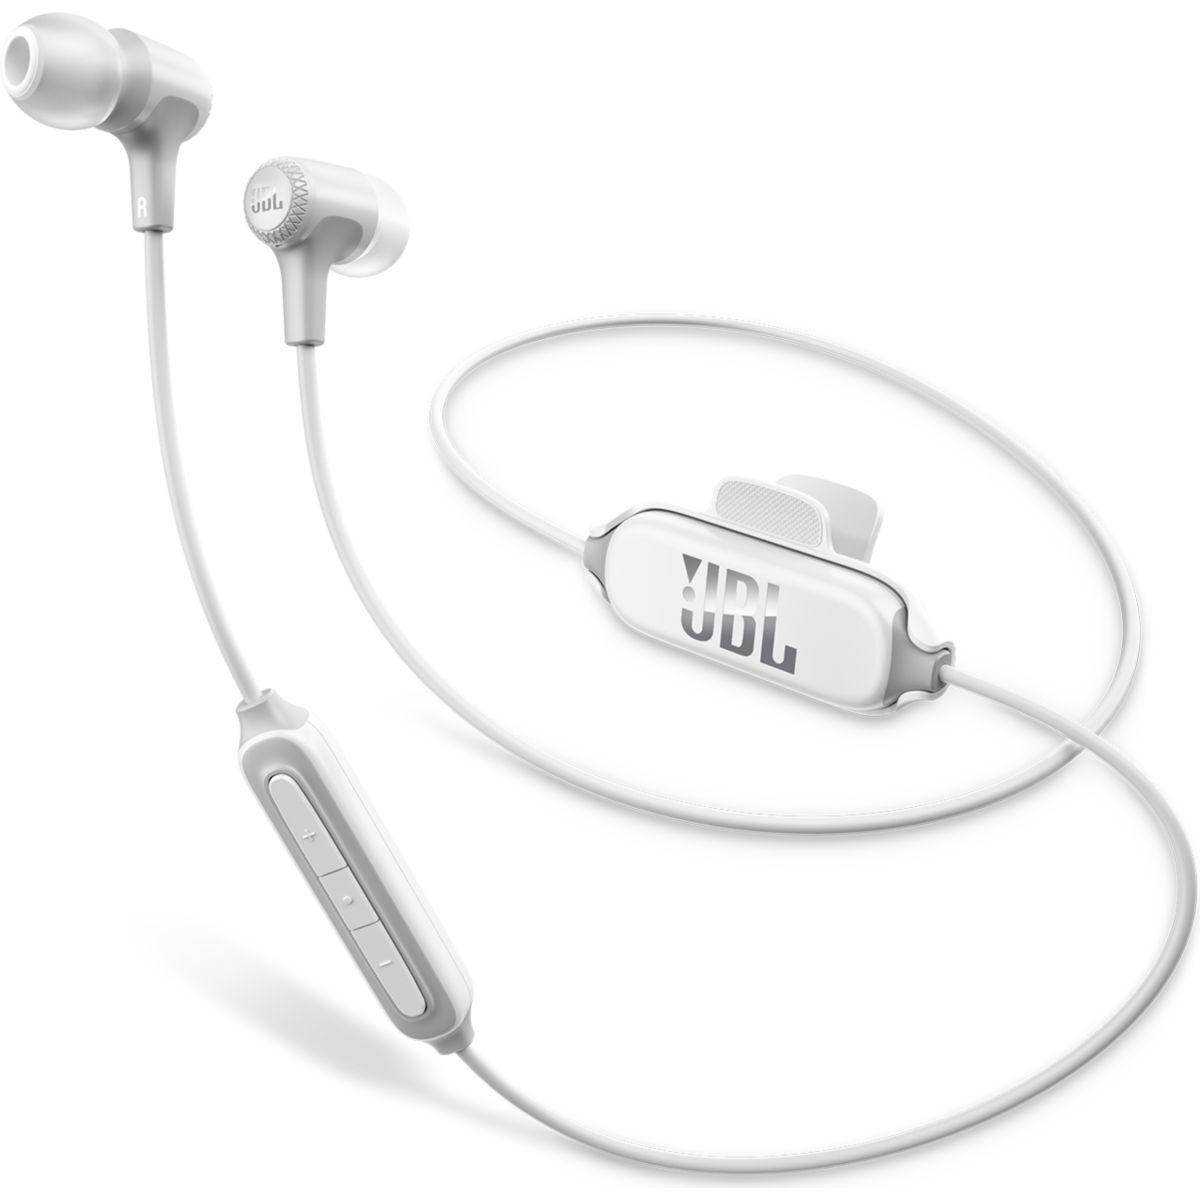 Ecouteurs intra jbl e25 bt blanc - livraison offerte : code liv